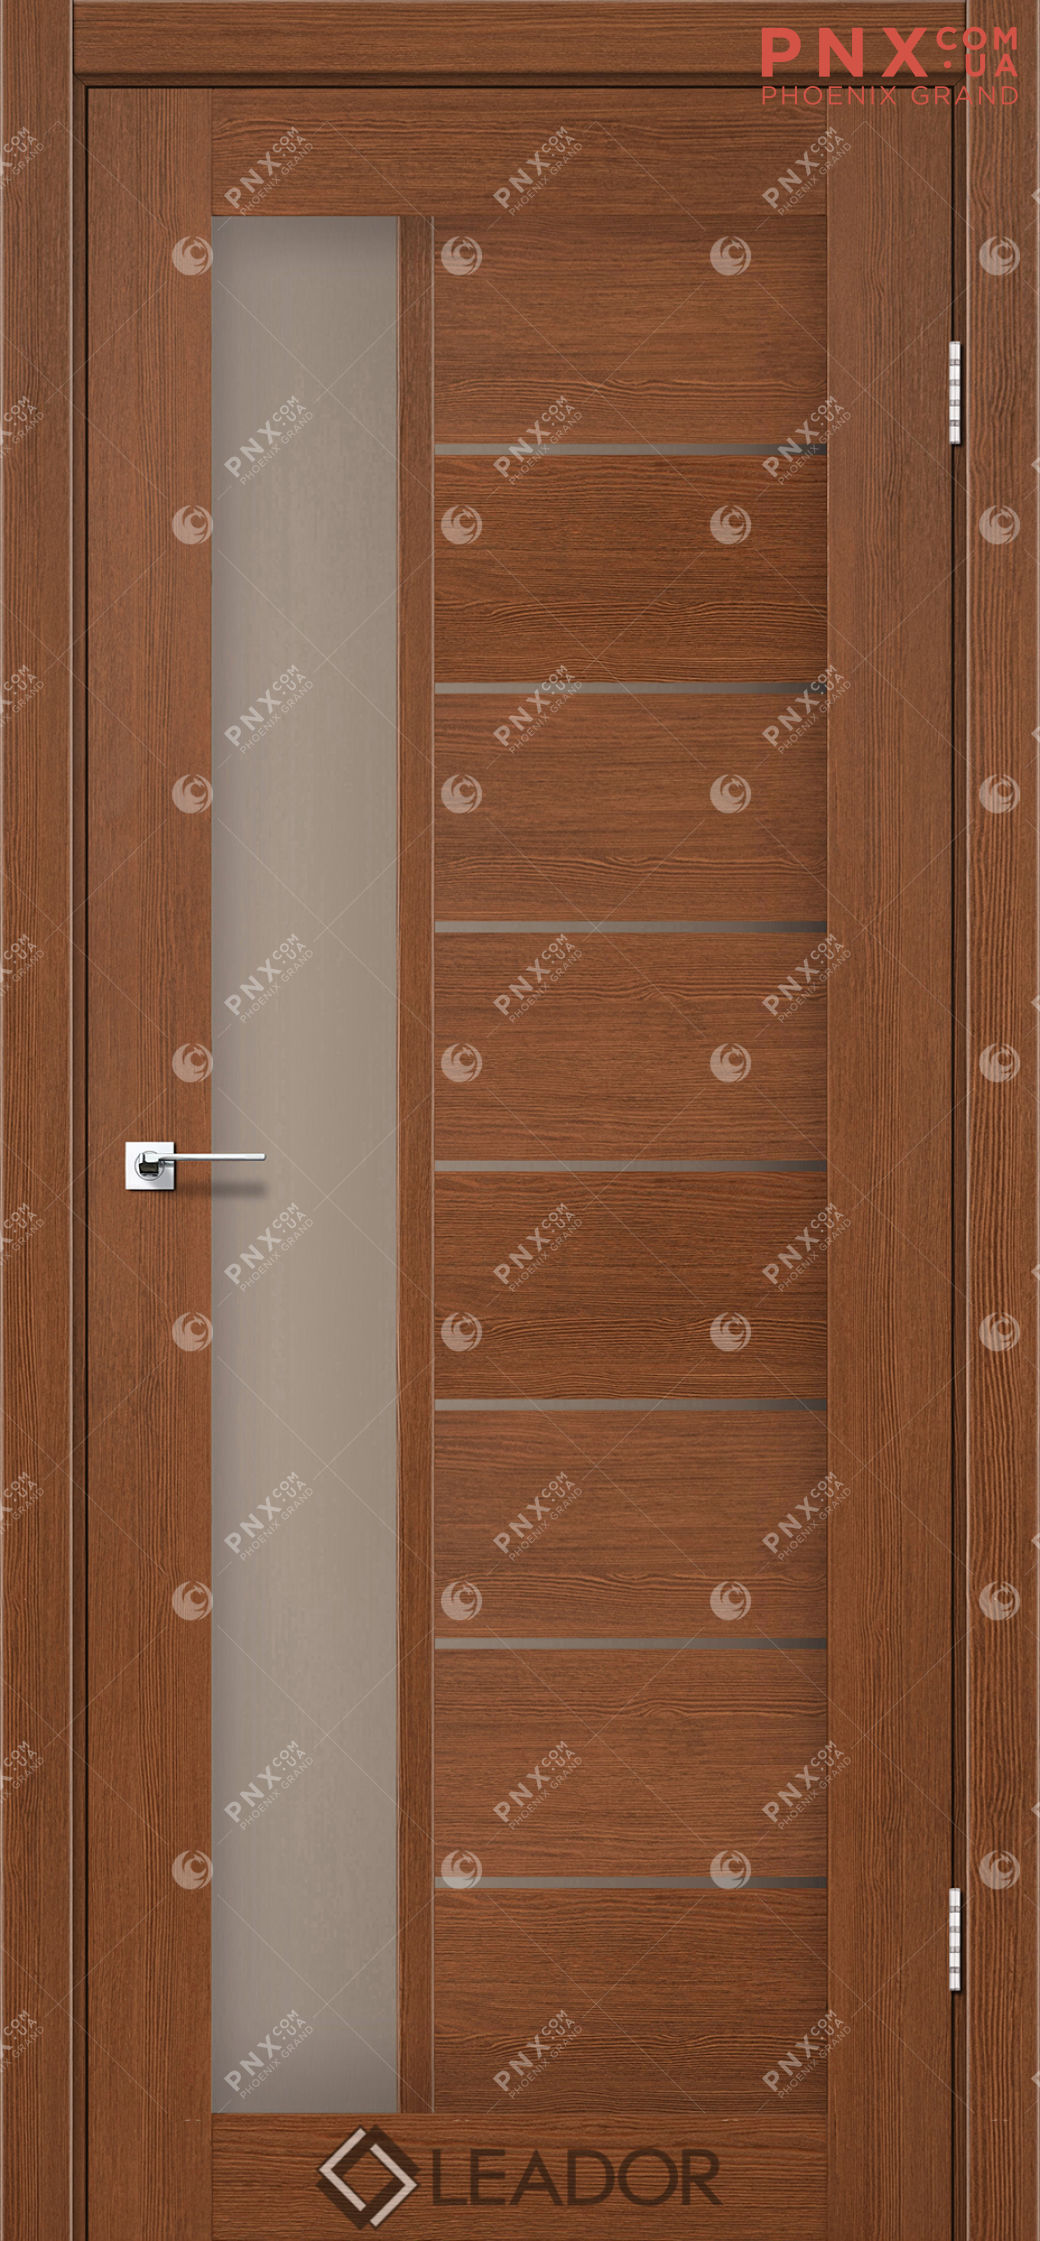 Межкомнатная дверь LEADOR Lorenza, Браун, Стекло сатин бронза